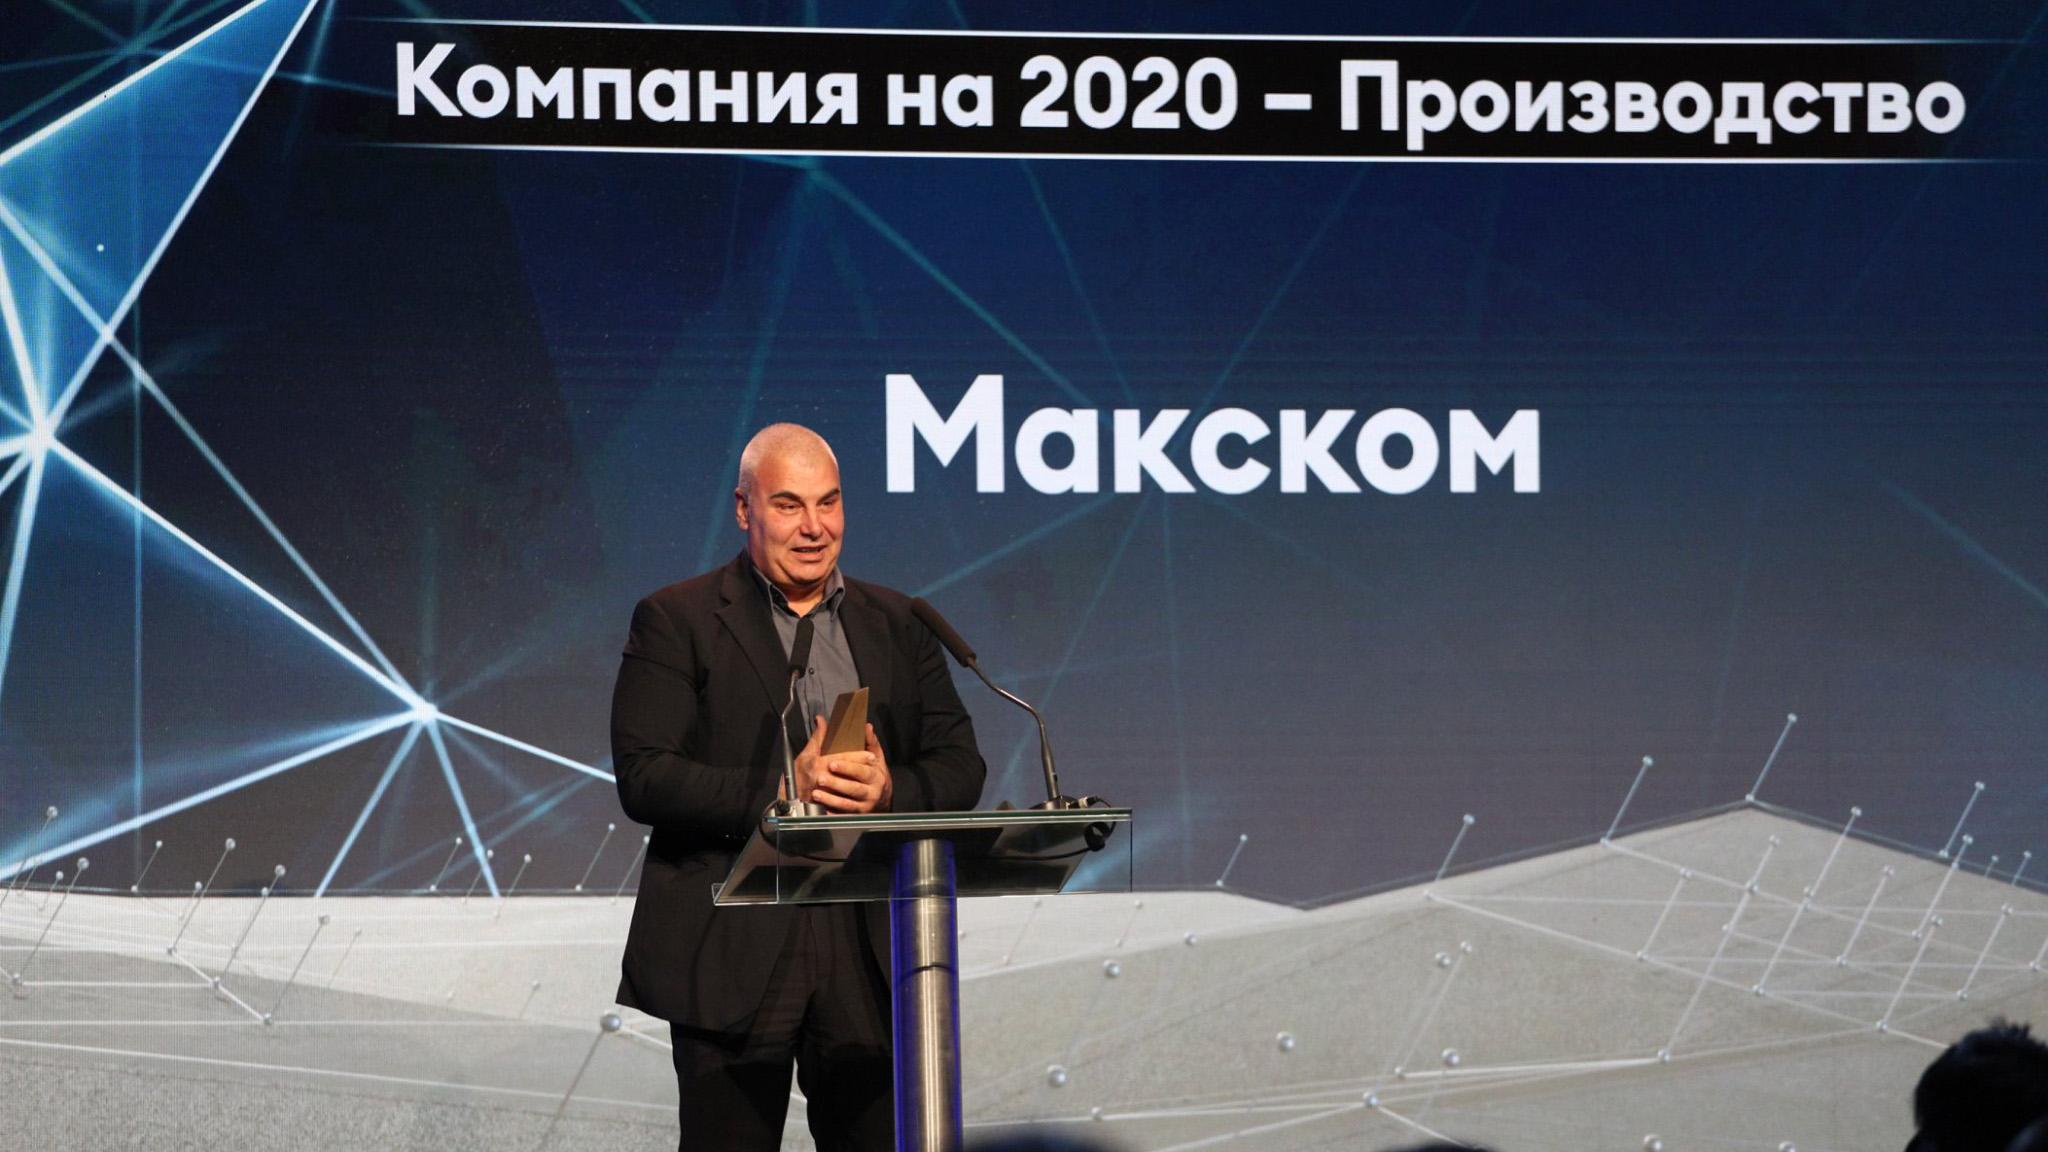 Nikolay_Videnov_Maxcom_FBA_2020